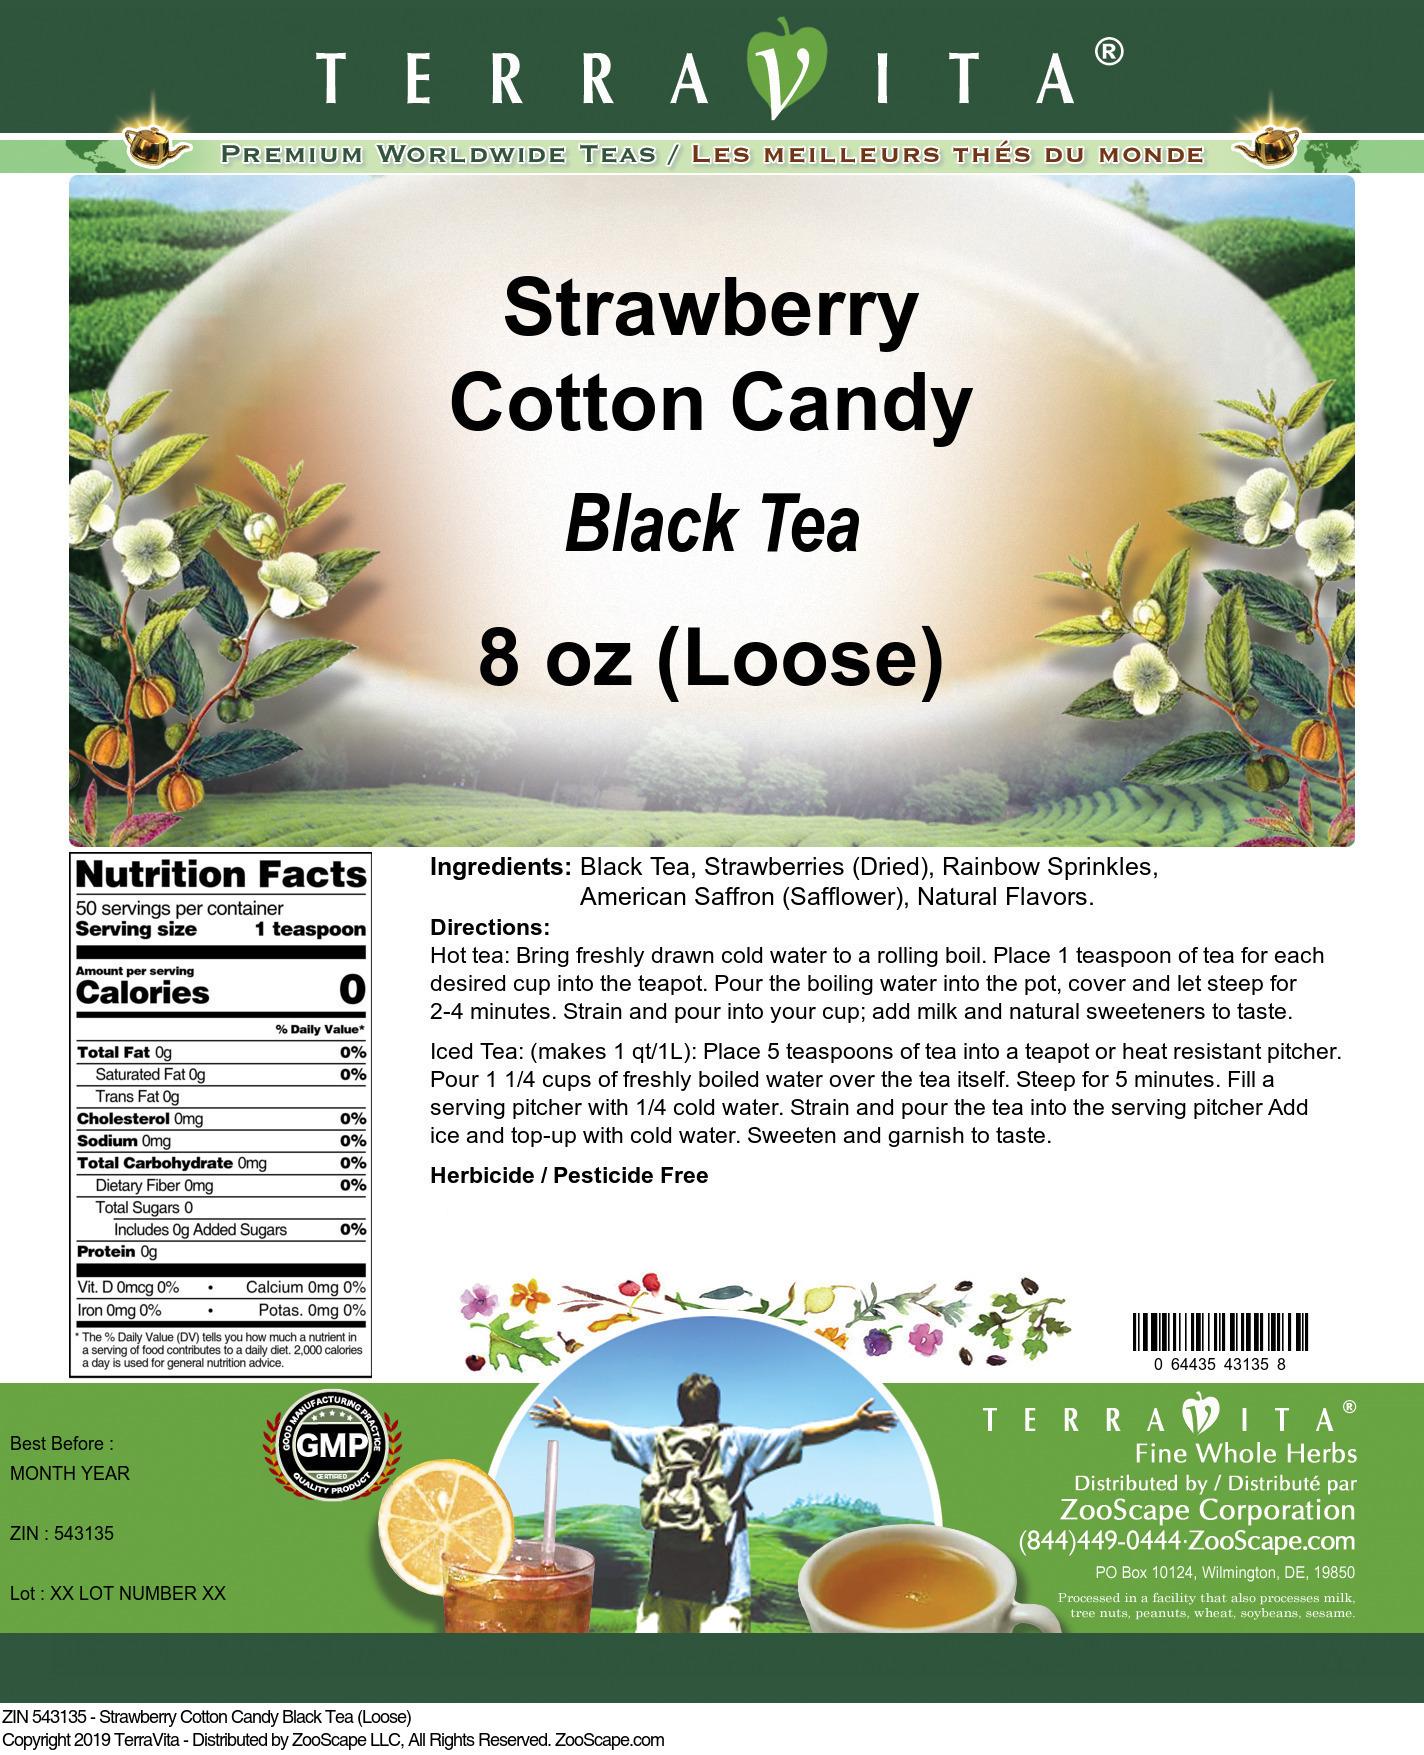 Strawberry Cotton Candy Black Tea (Loose)